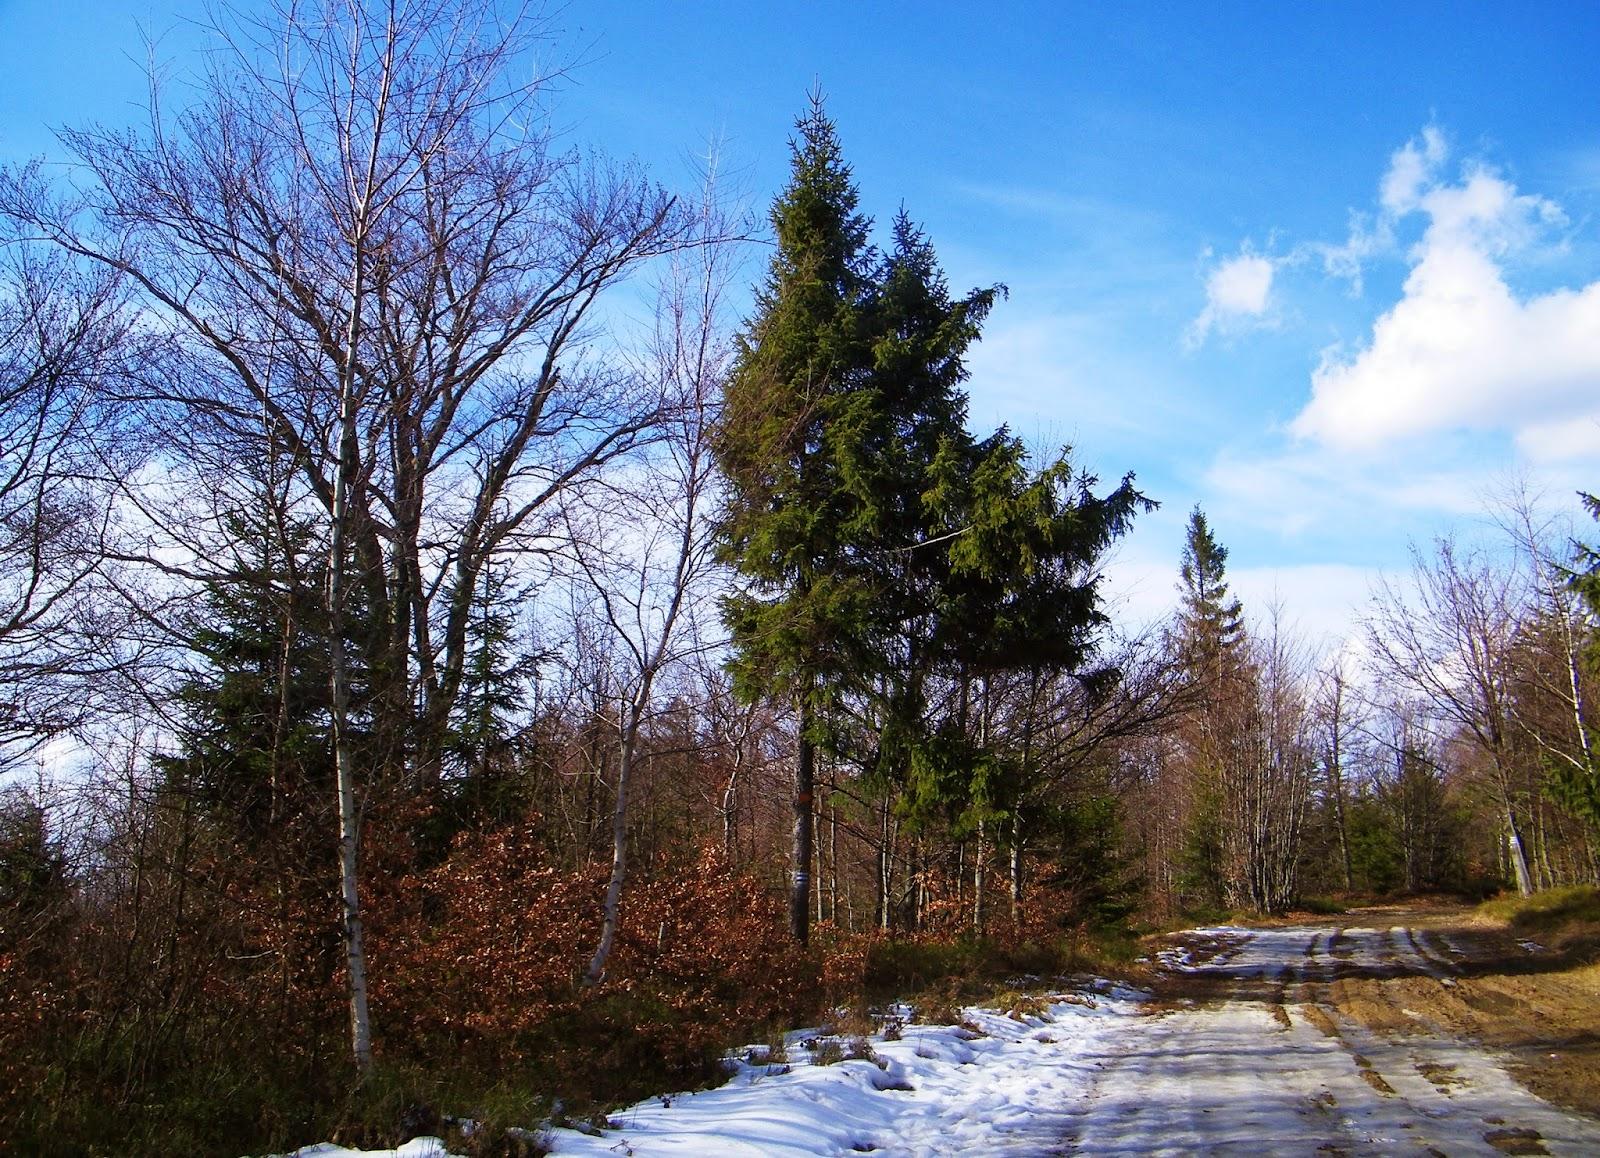 Szlak na Czupel - Beskid Mały